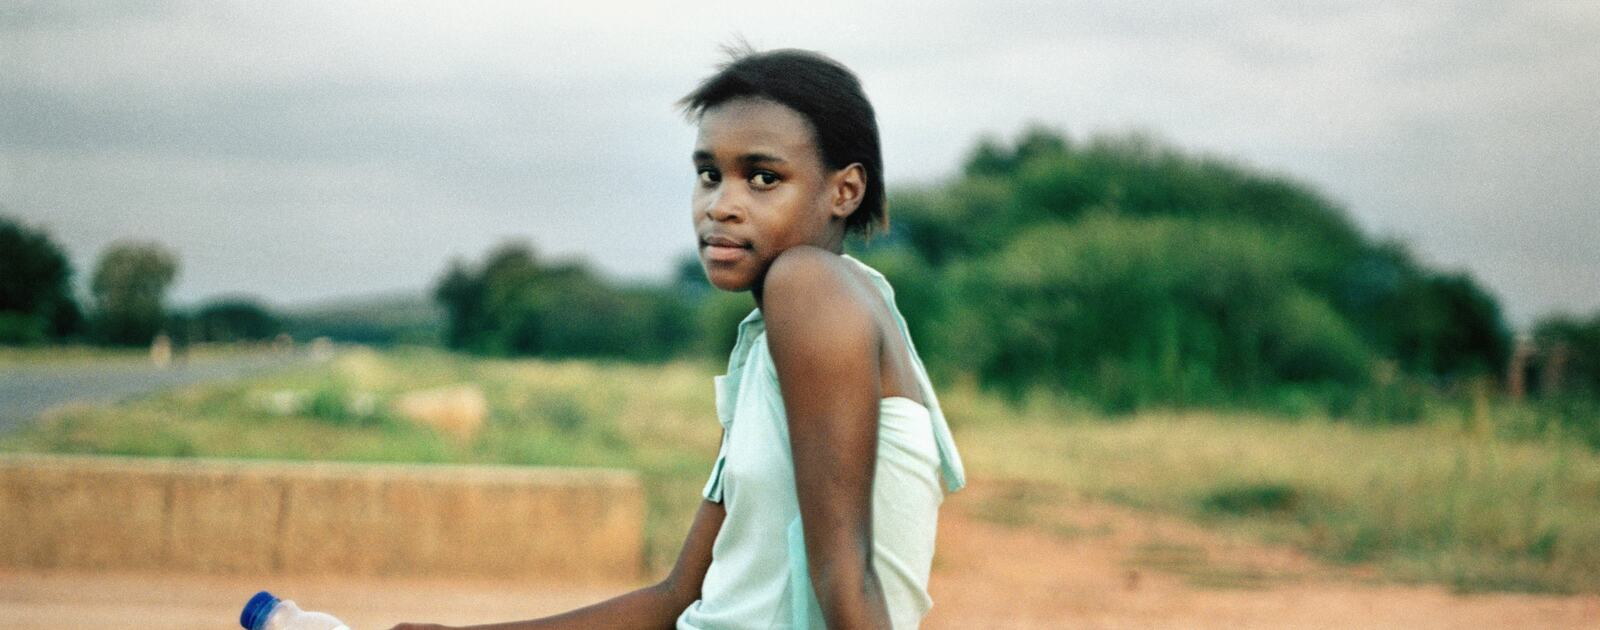 Homeland, Nklele Machika or Mary Koketse, Sehoko, former Bophuthatswana (2010) a photograph by Thabiso Sekgala depicting a young woman sitting on a concrete wall